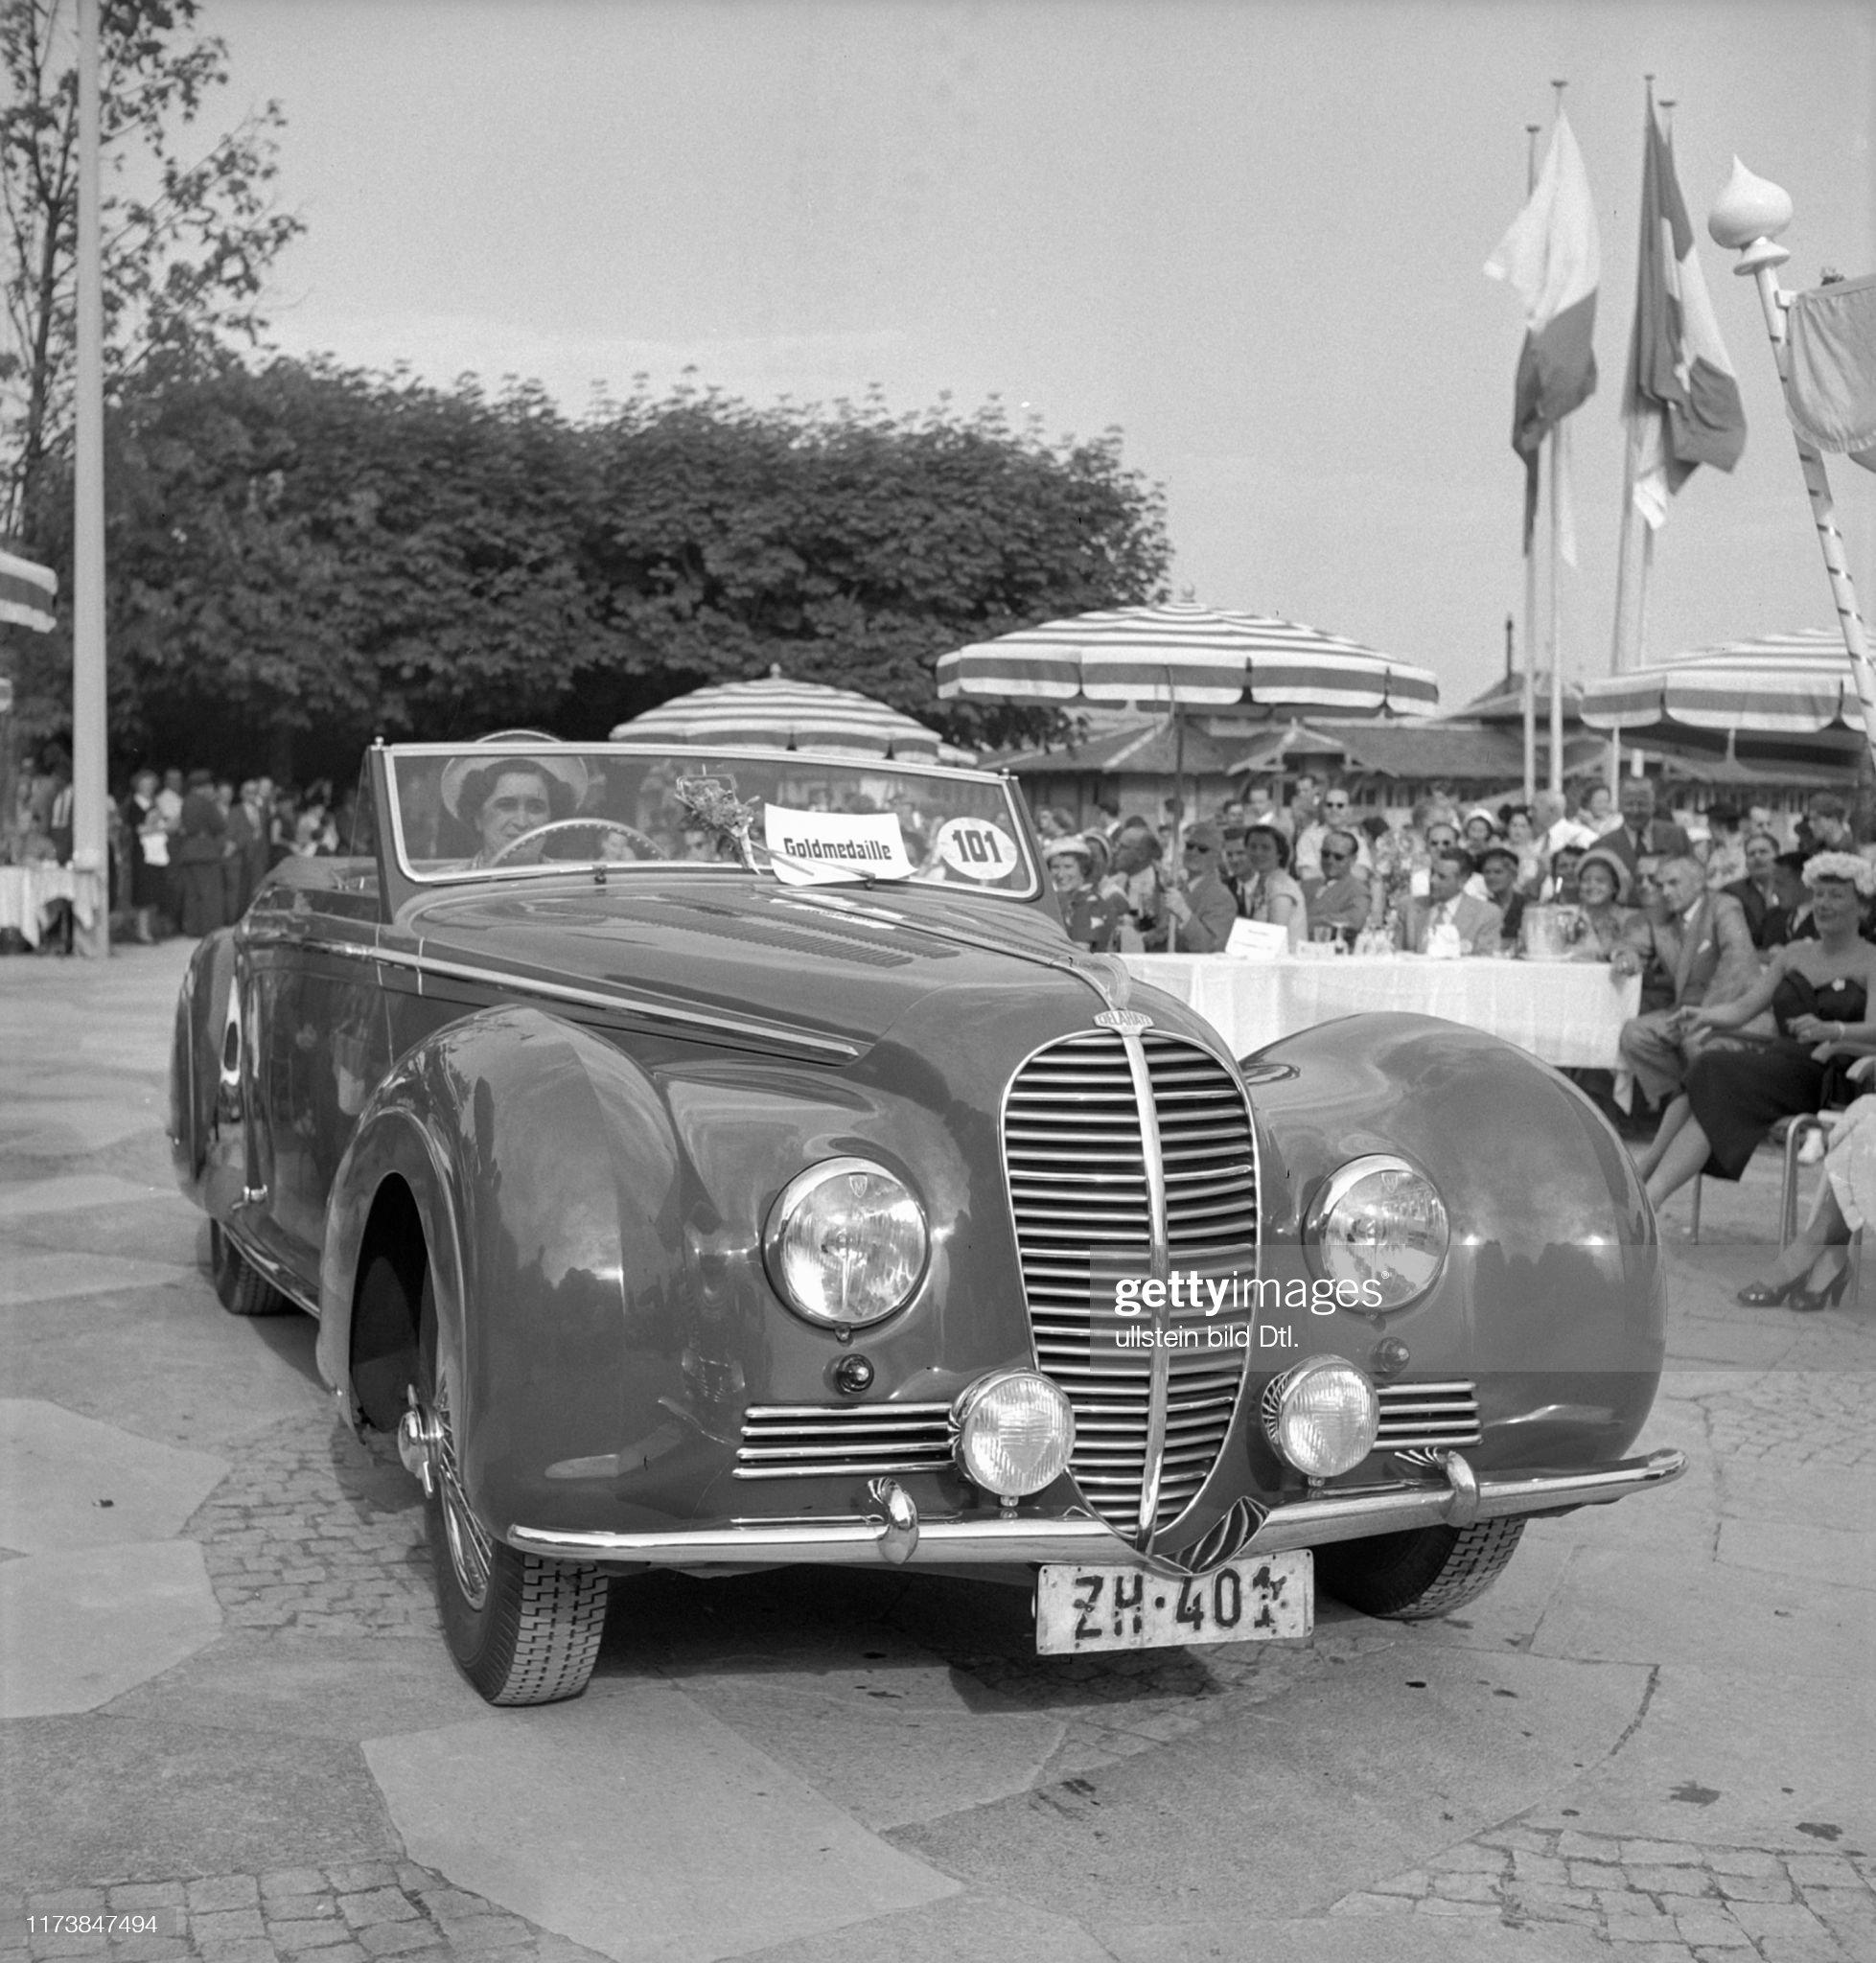 6th International car model beauty contest, Lucerne 1951: Delahaye 1950/51 : News Photo